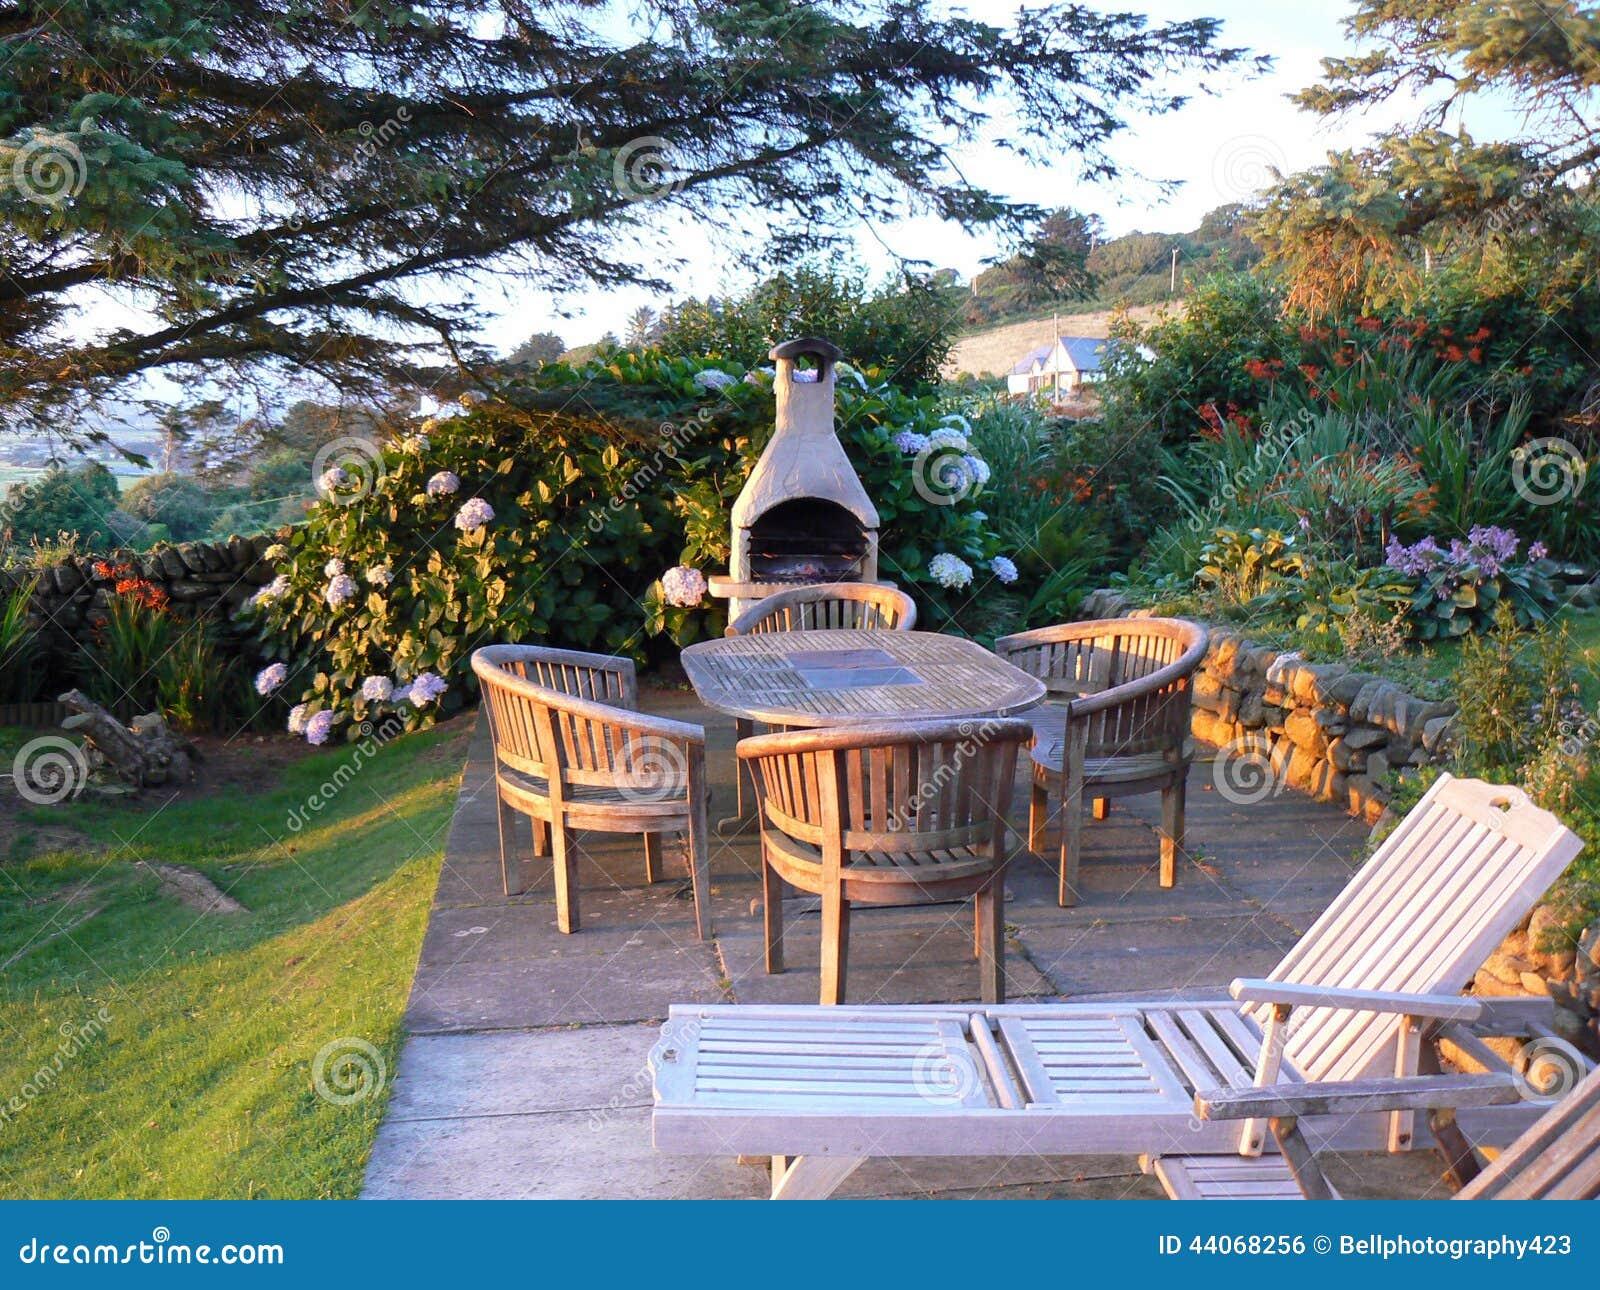 English Garden With Luxury Wooden Garden Furniture Stock Photo Image 44068256